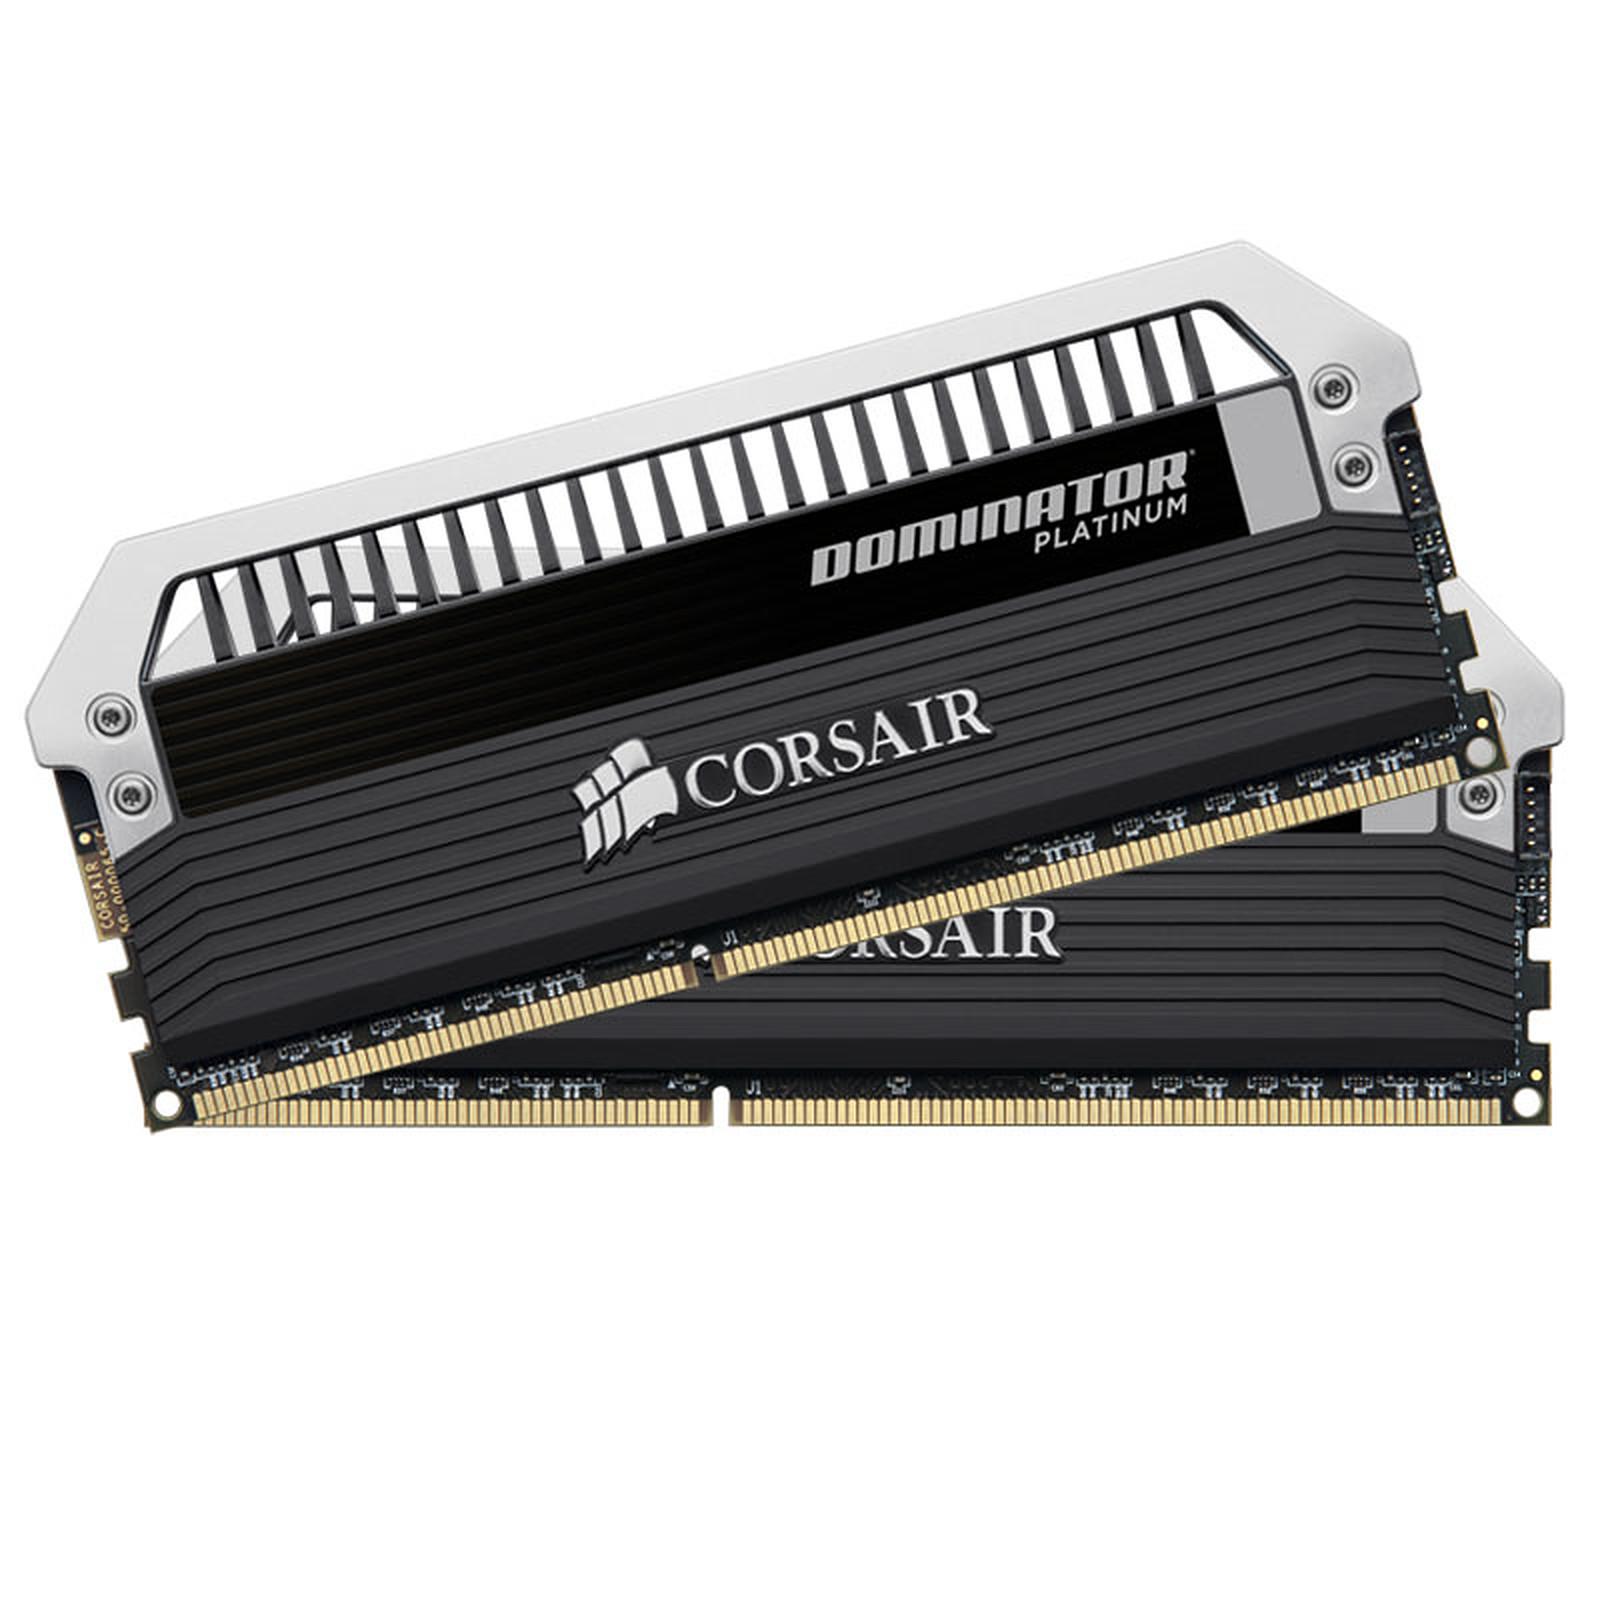 Corsair Dominator Platinum 16 Go (2 x 8 Go) DDR3 2400 MHz CL11